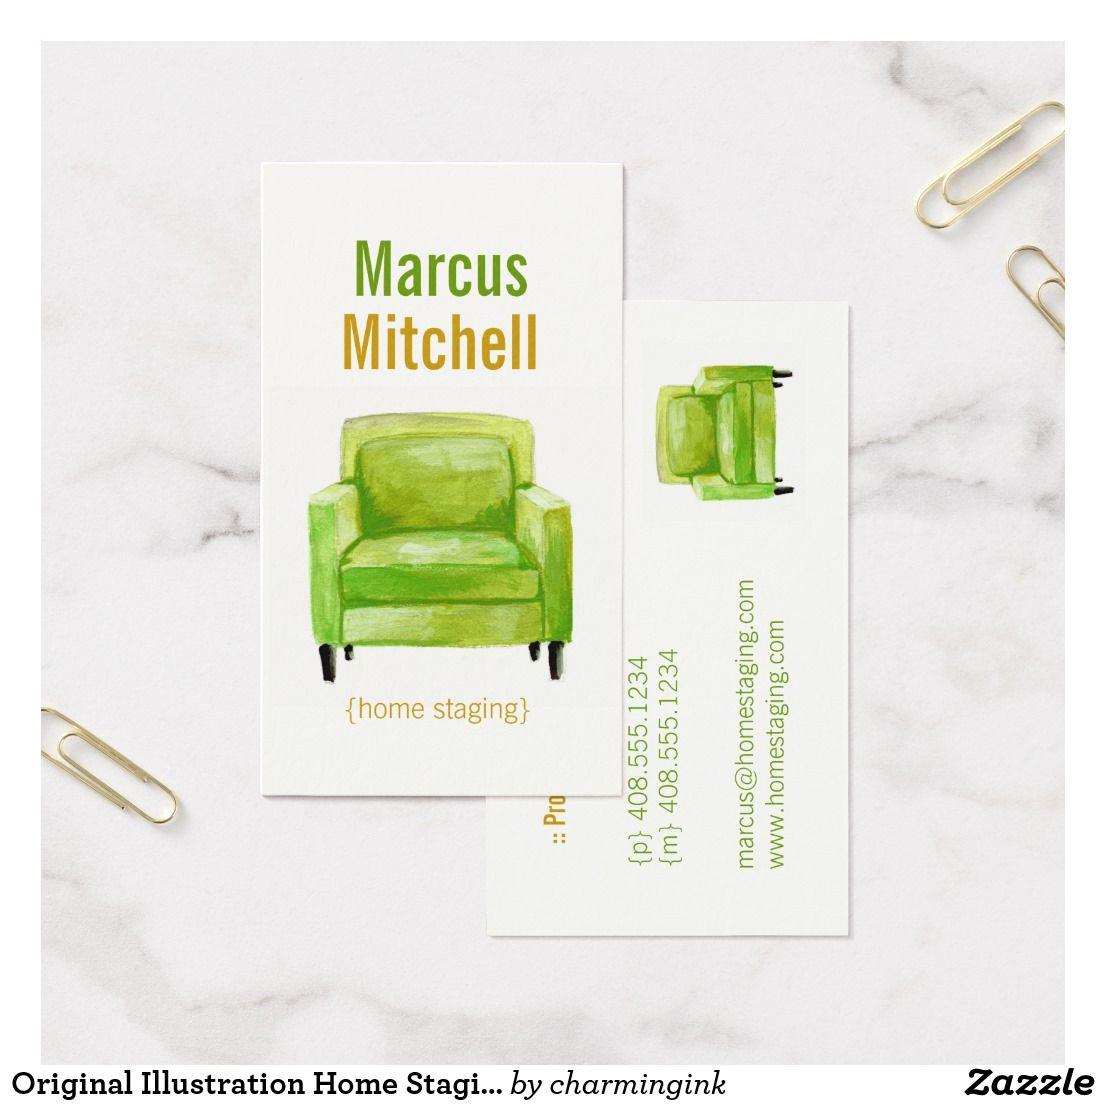 Original Illustration Home Staging Business Cards | Business ...